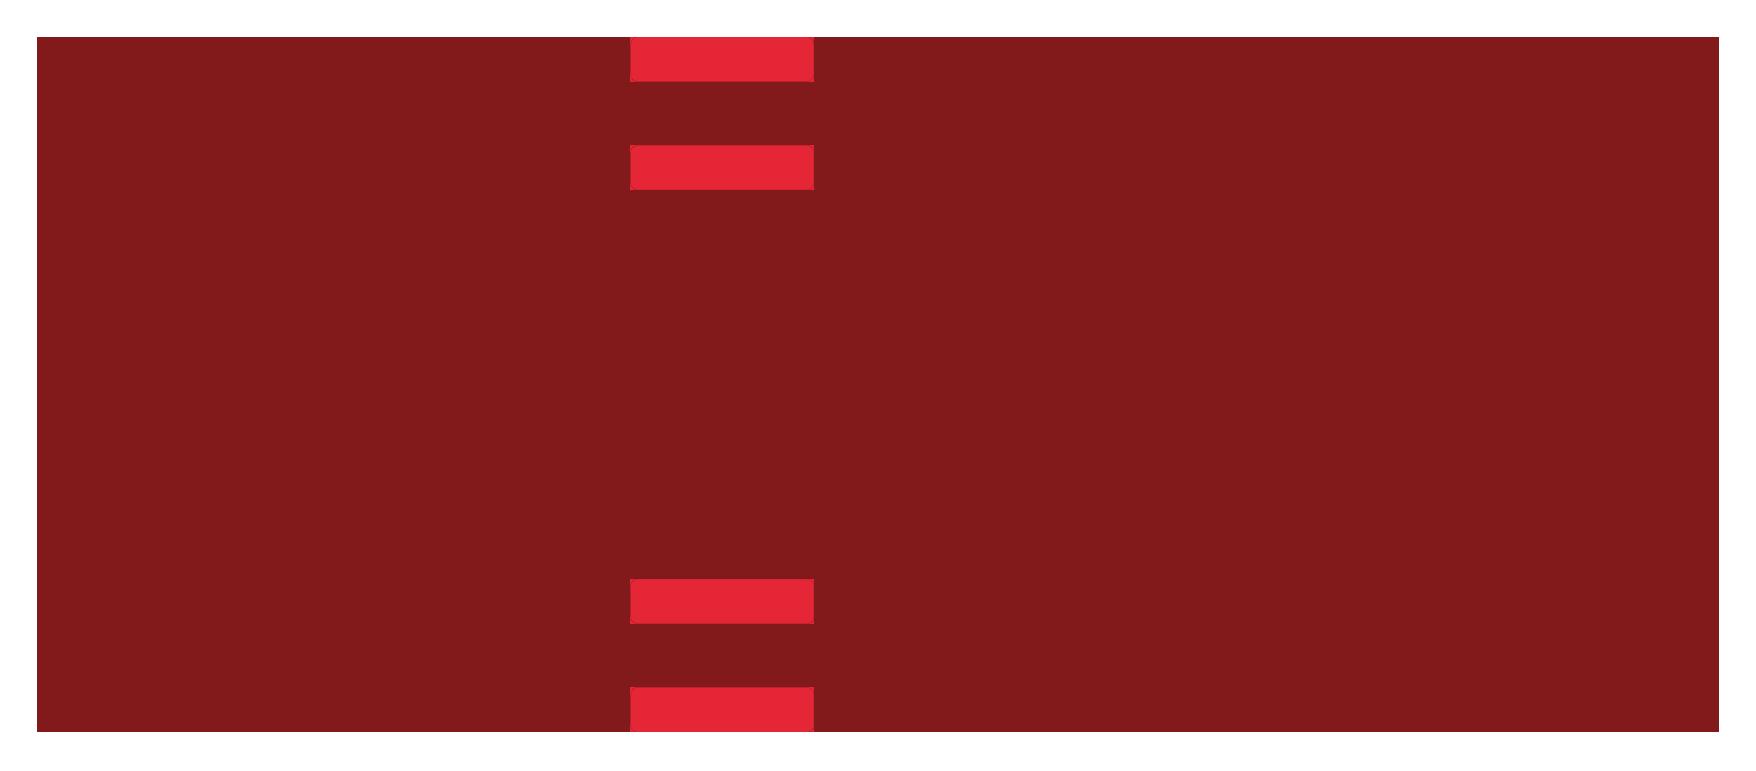 OPEN_oral_health_progress_equity_network_rgb